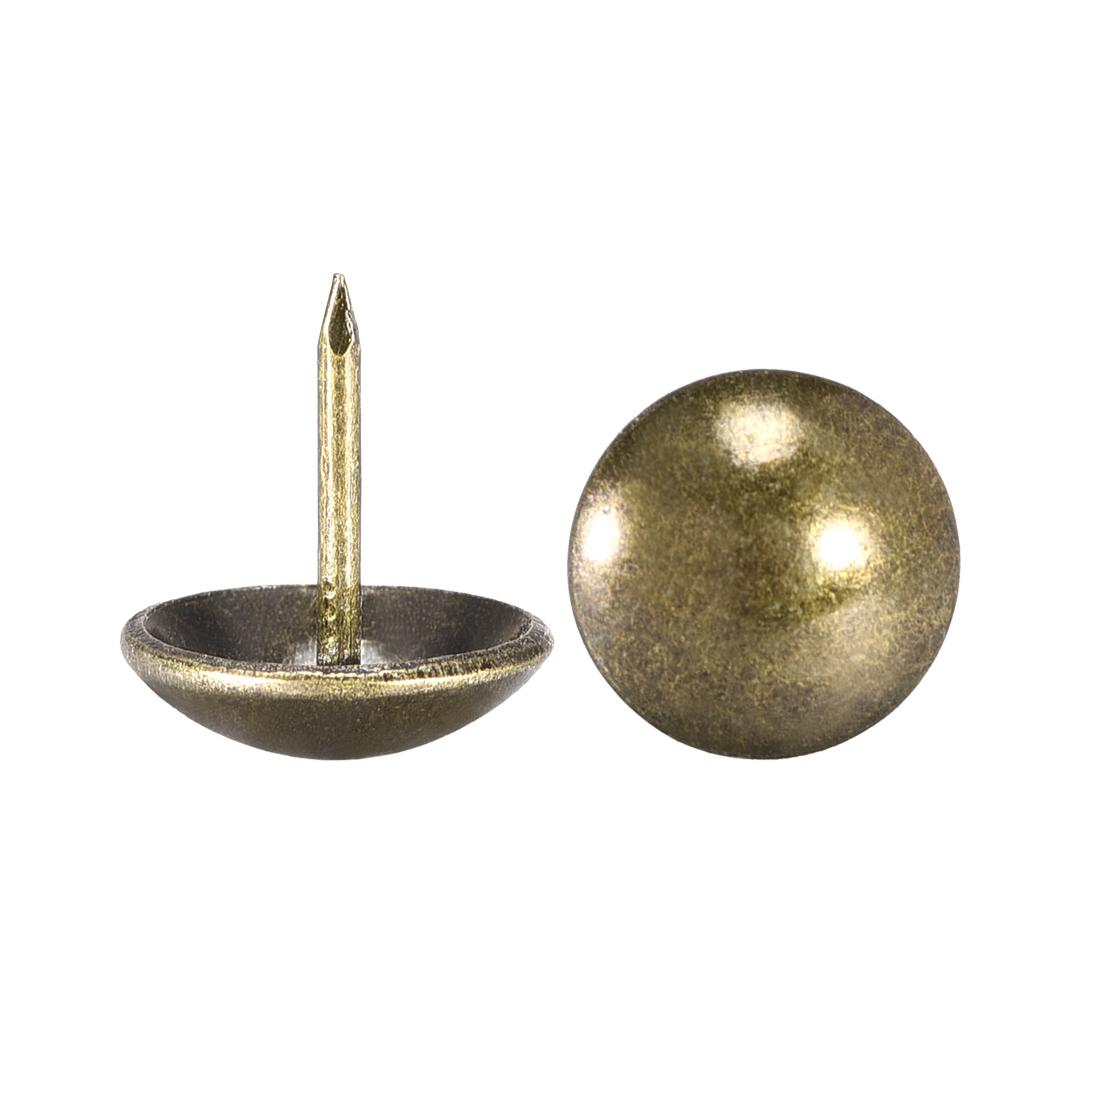 Upholstery Nails Tacks 16mm Dia 17mm Height Round Push Pins Bronze Tone 30 Pcs